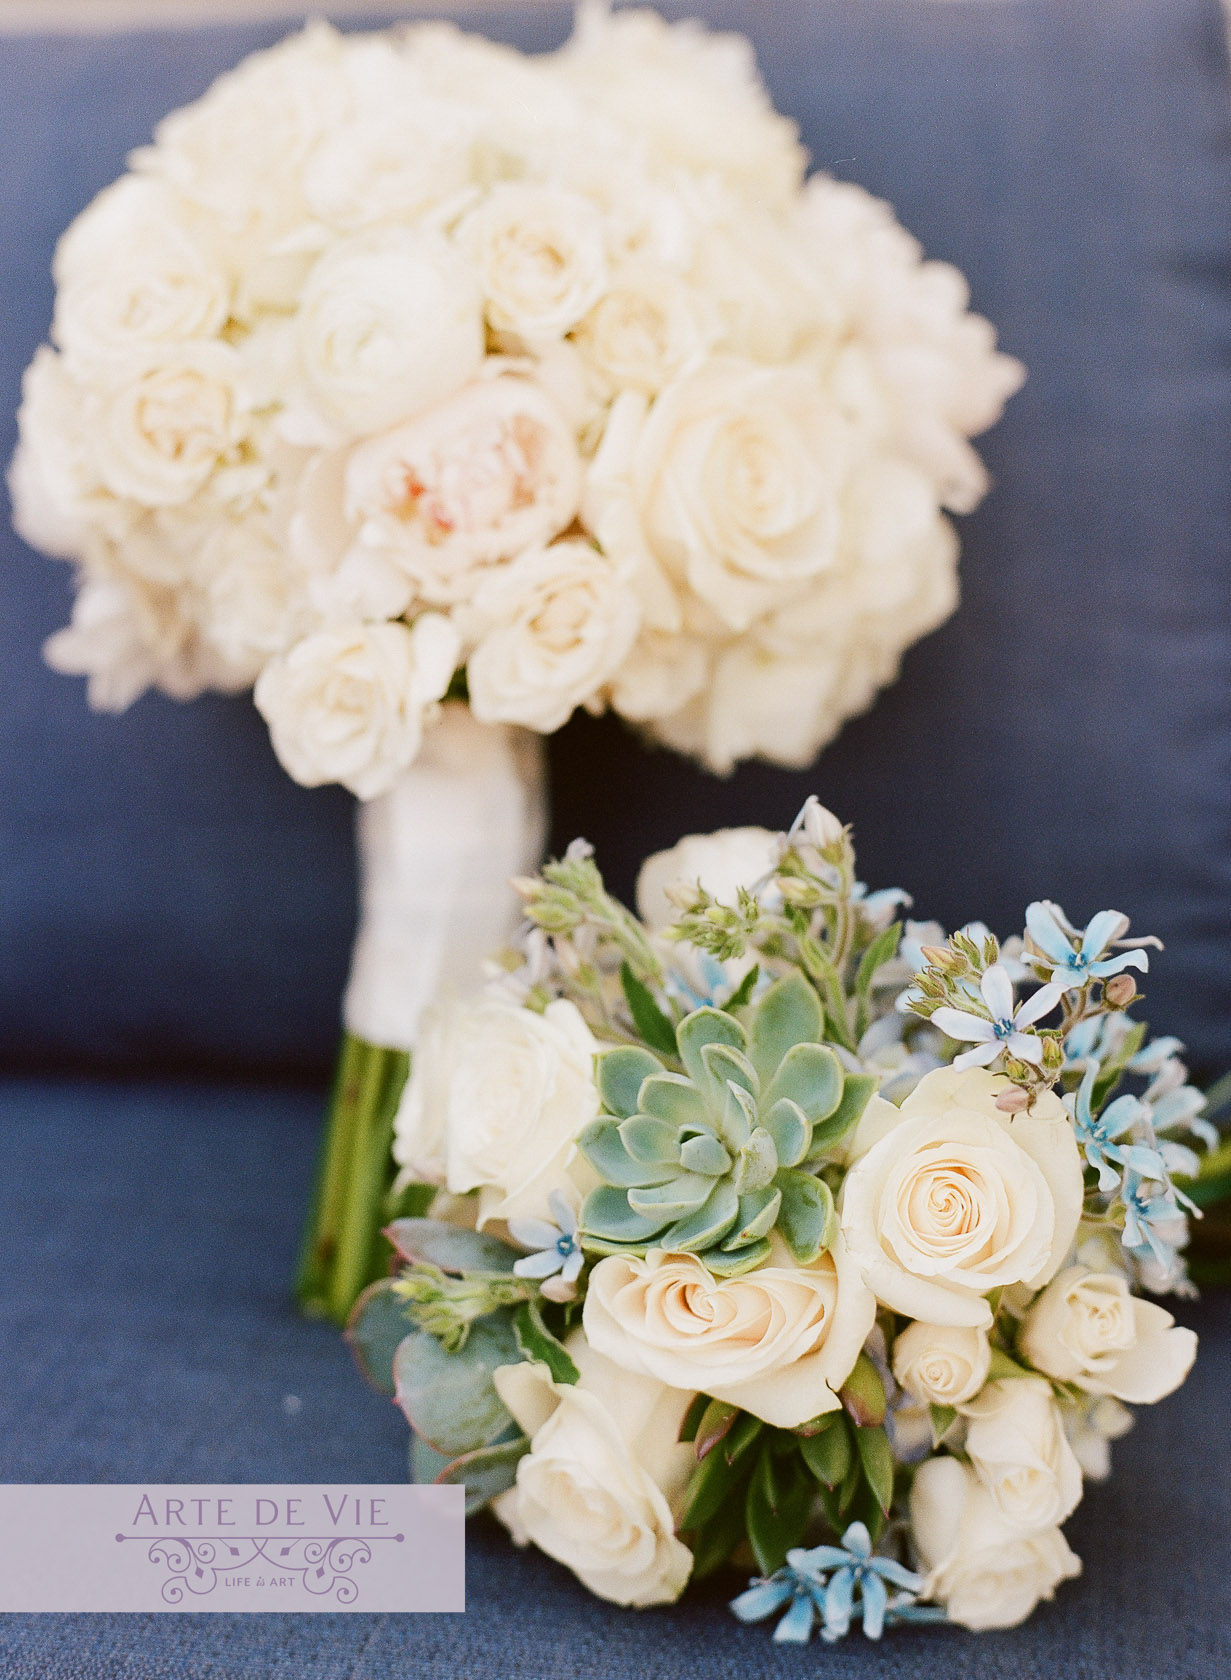 09-Echols Wedding Film Images.jpg